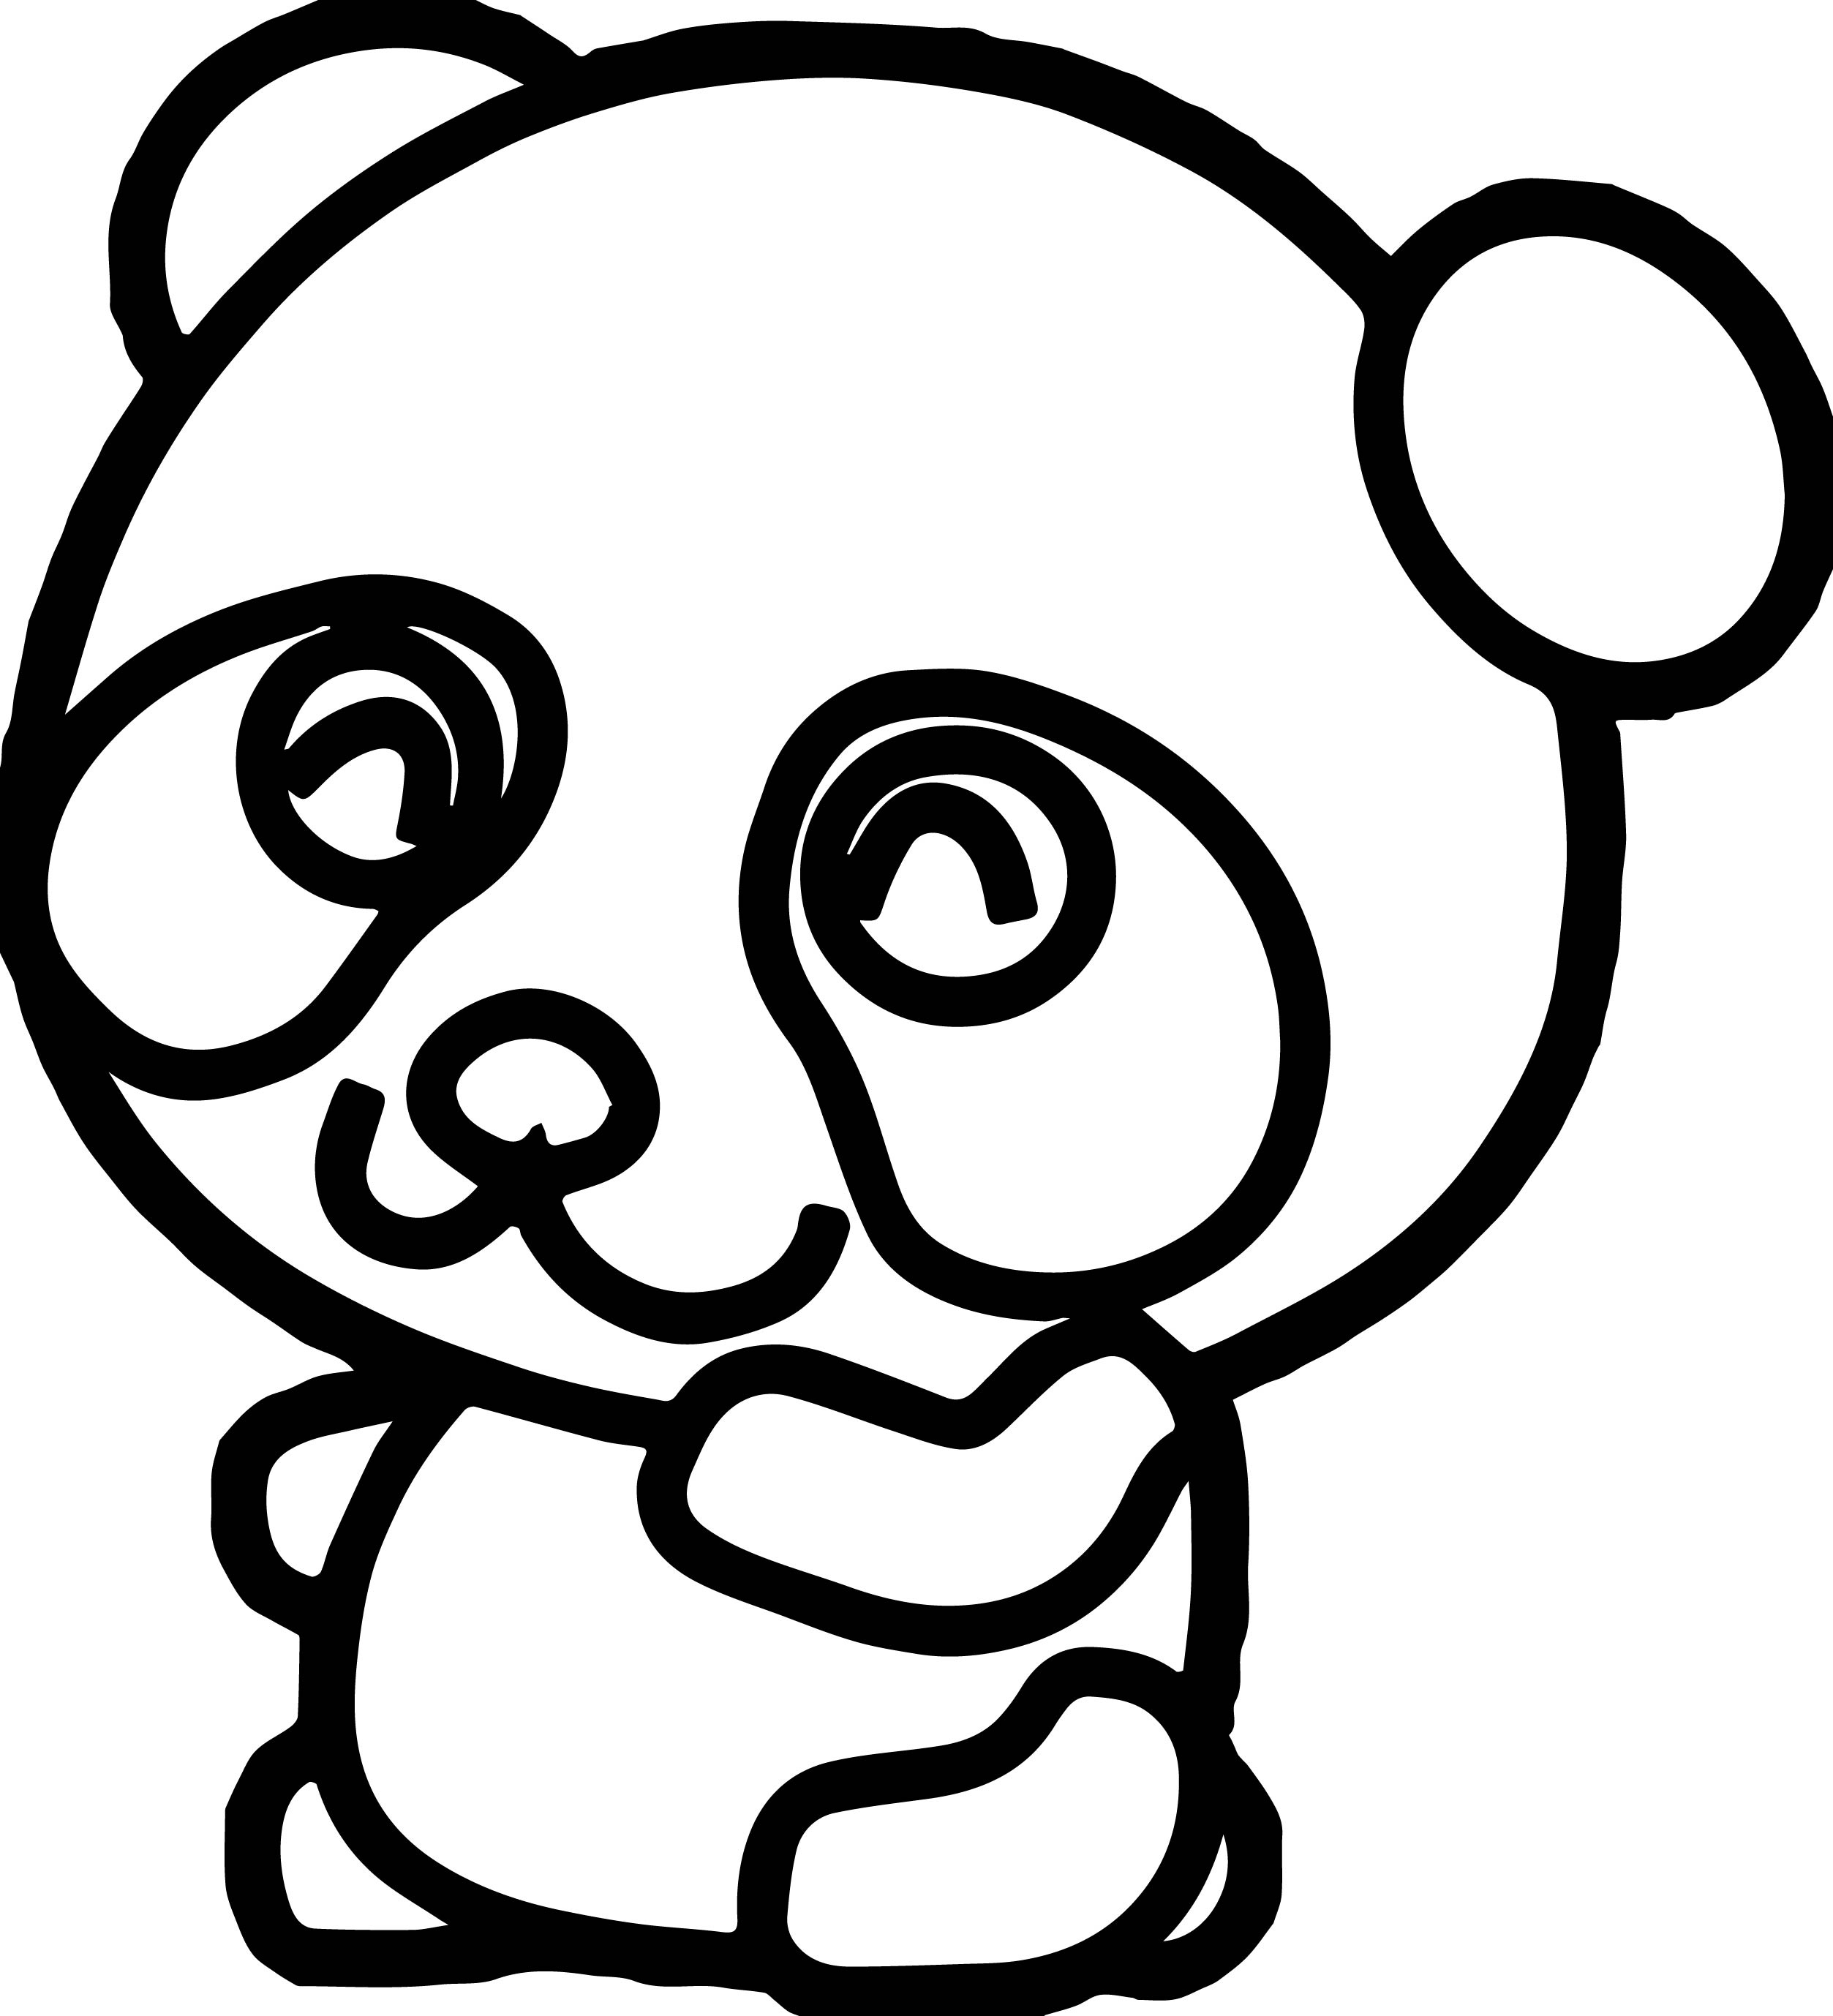 2506x2756 Panda Coloring Pages Beautiful Panda Bear Coloring Pages